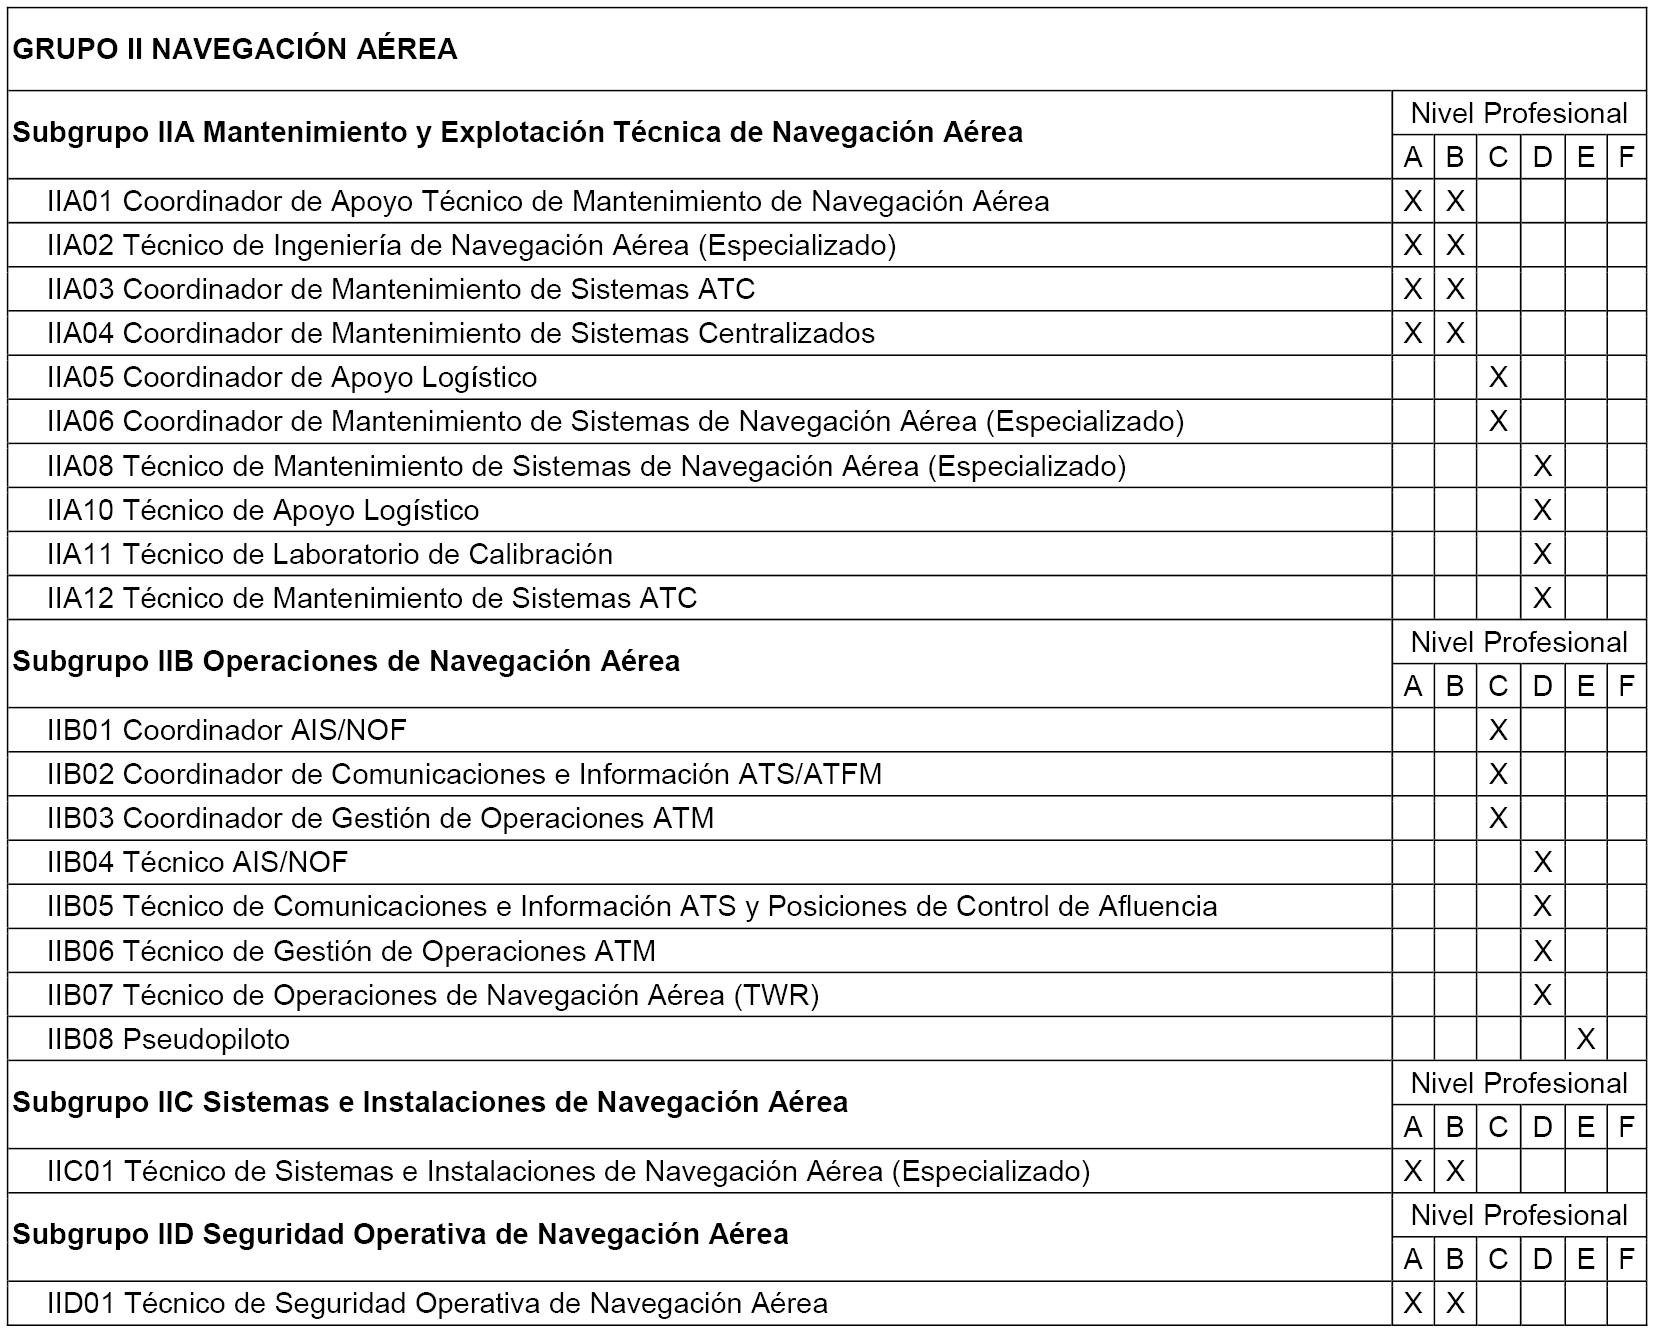 BOE.es - Documento BOE-A-2010-715